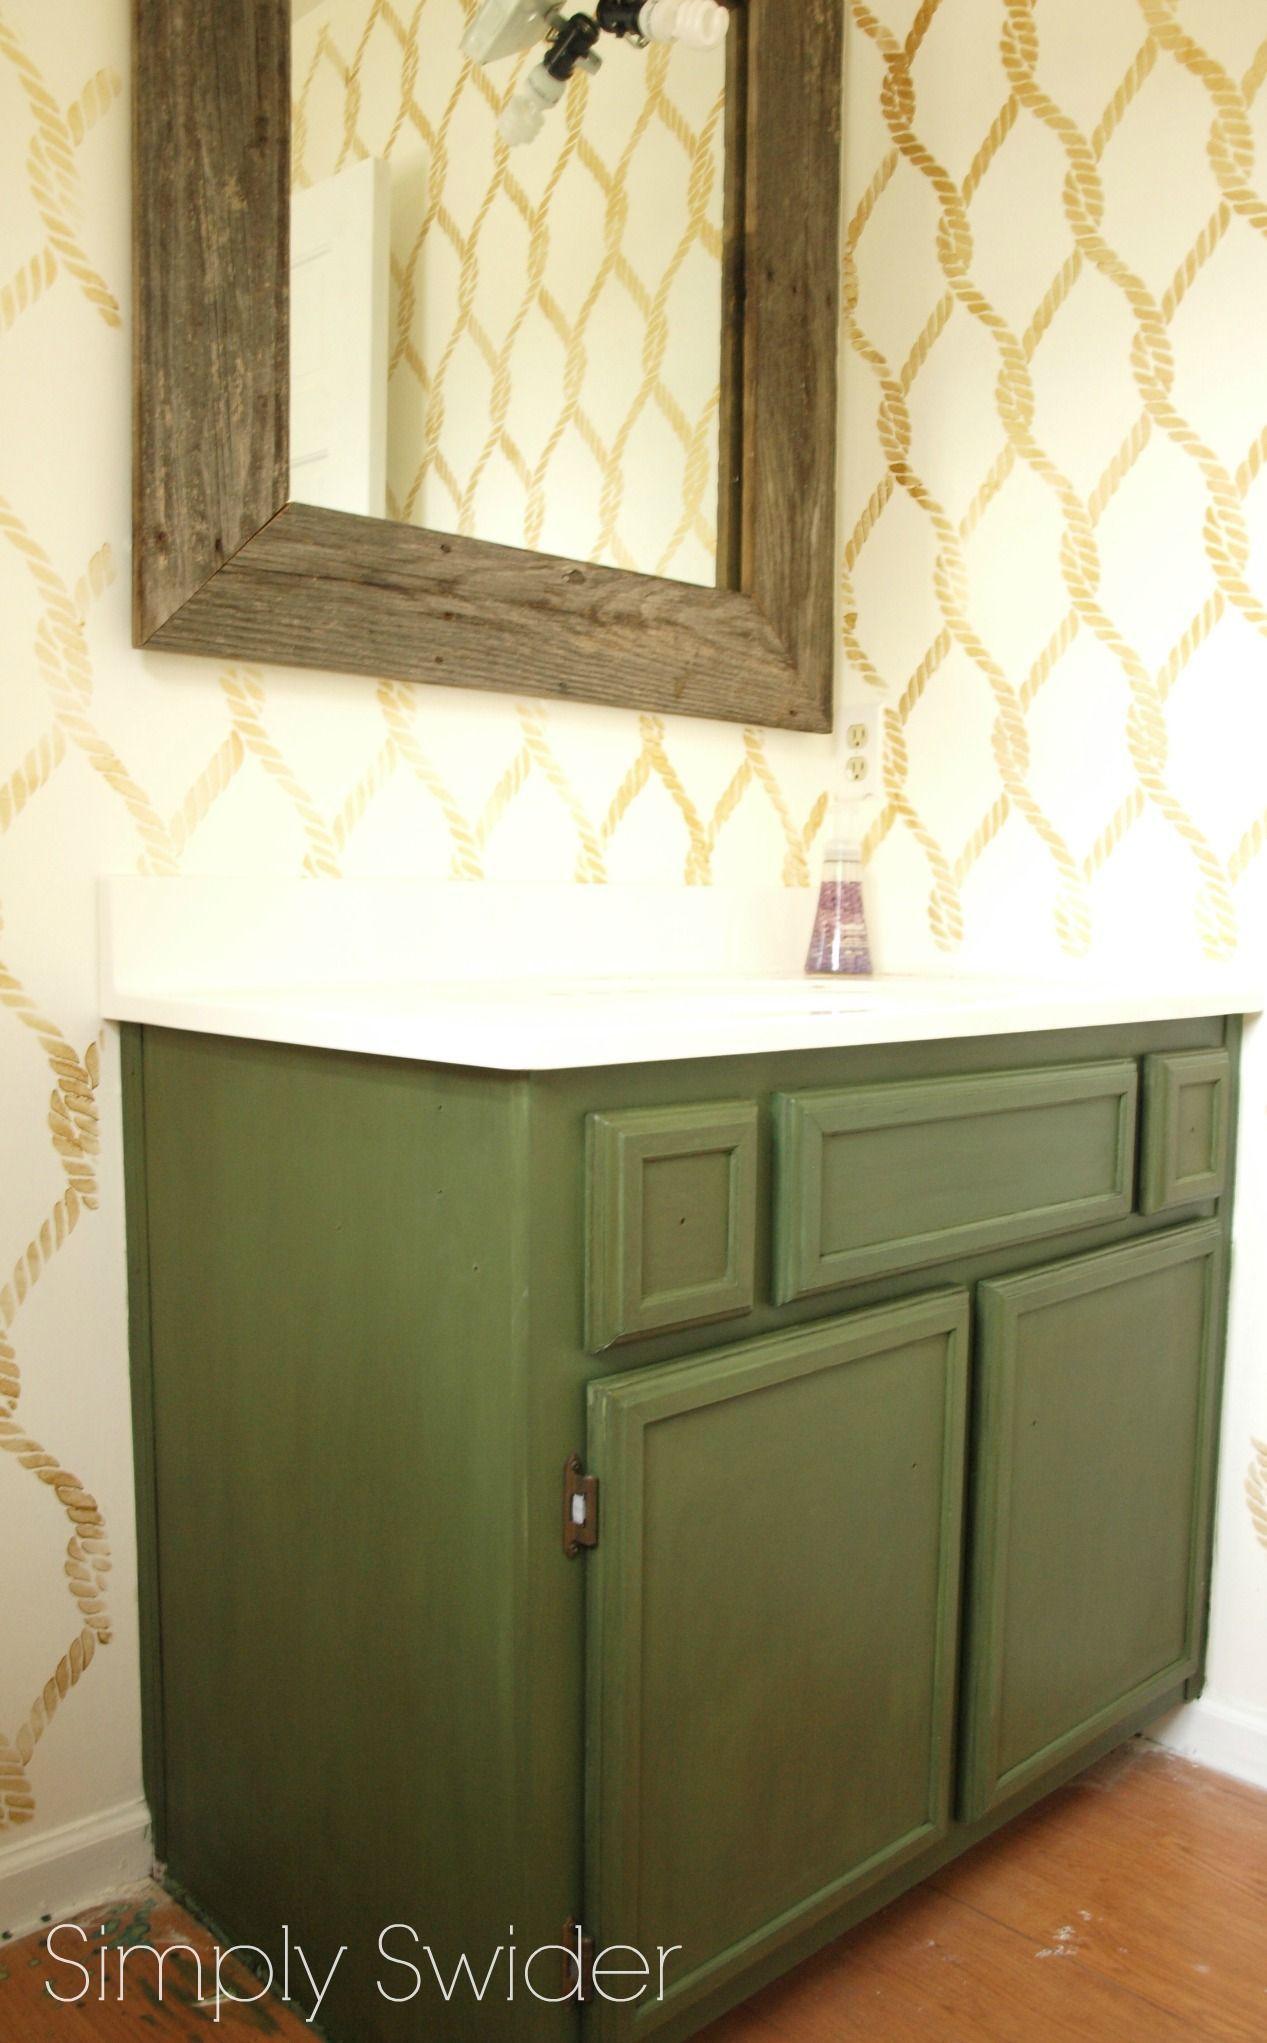 miss mustard seed's boxwood | Laminate cabinets, Bathroom ...